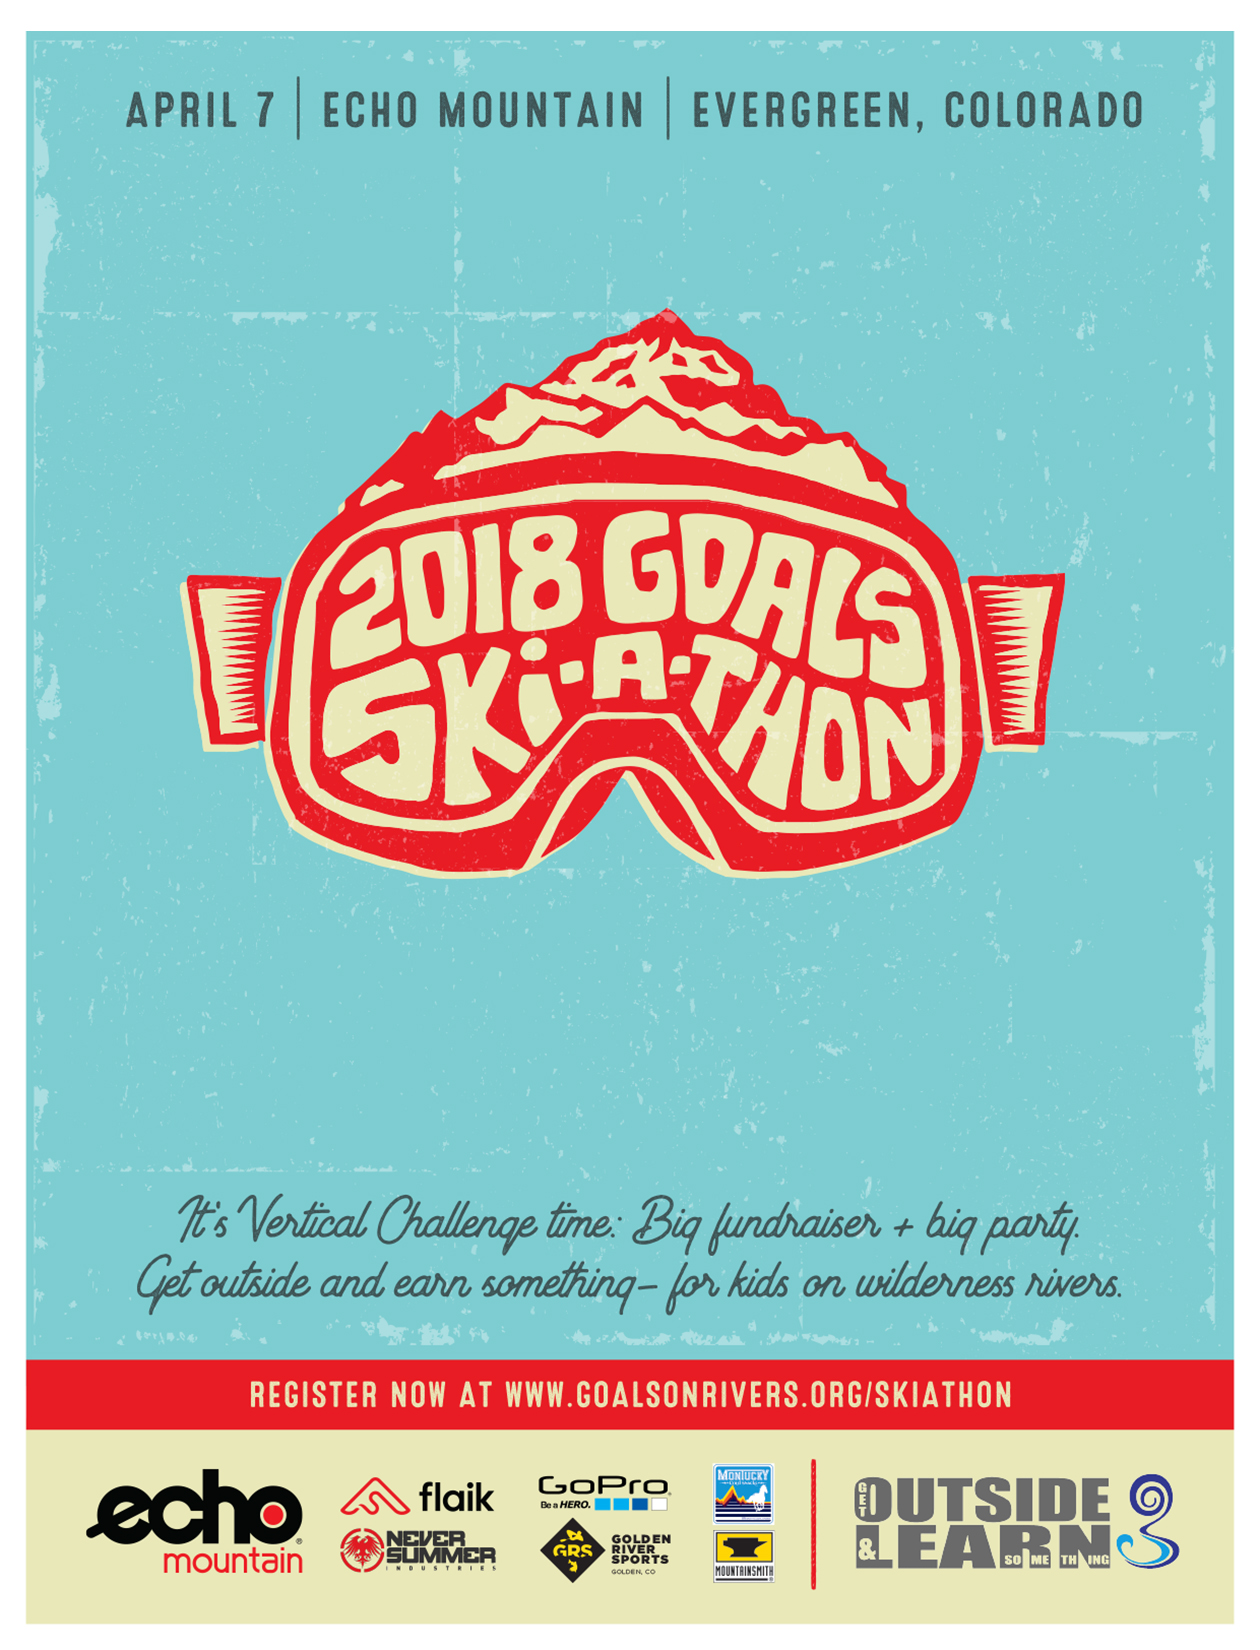 goals_vistaprint_flyer_r3.jpg